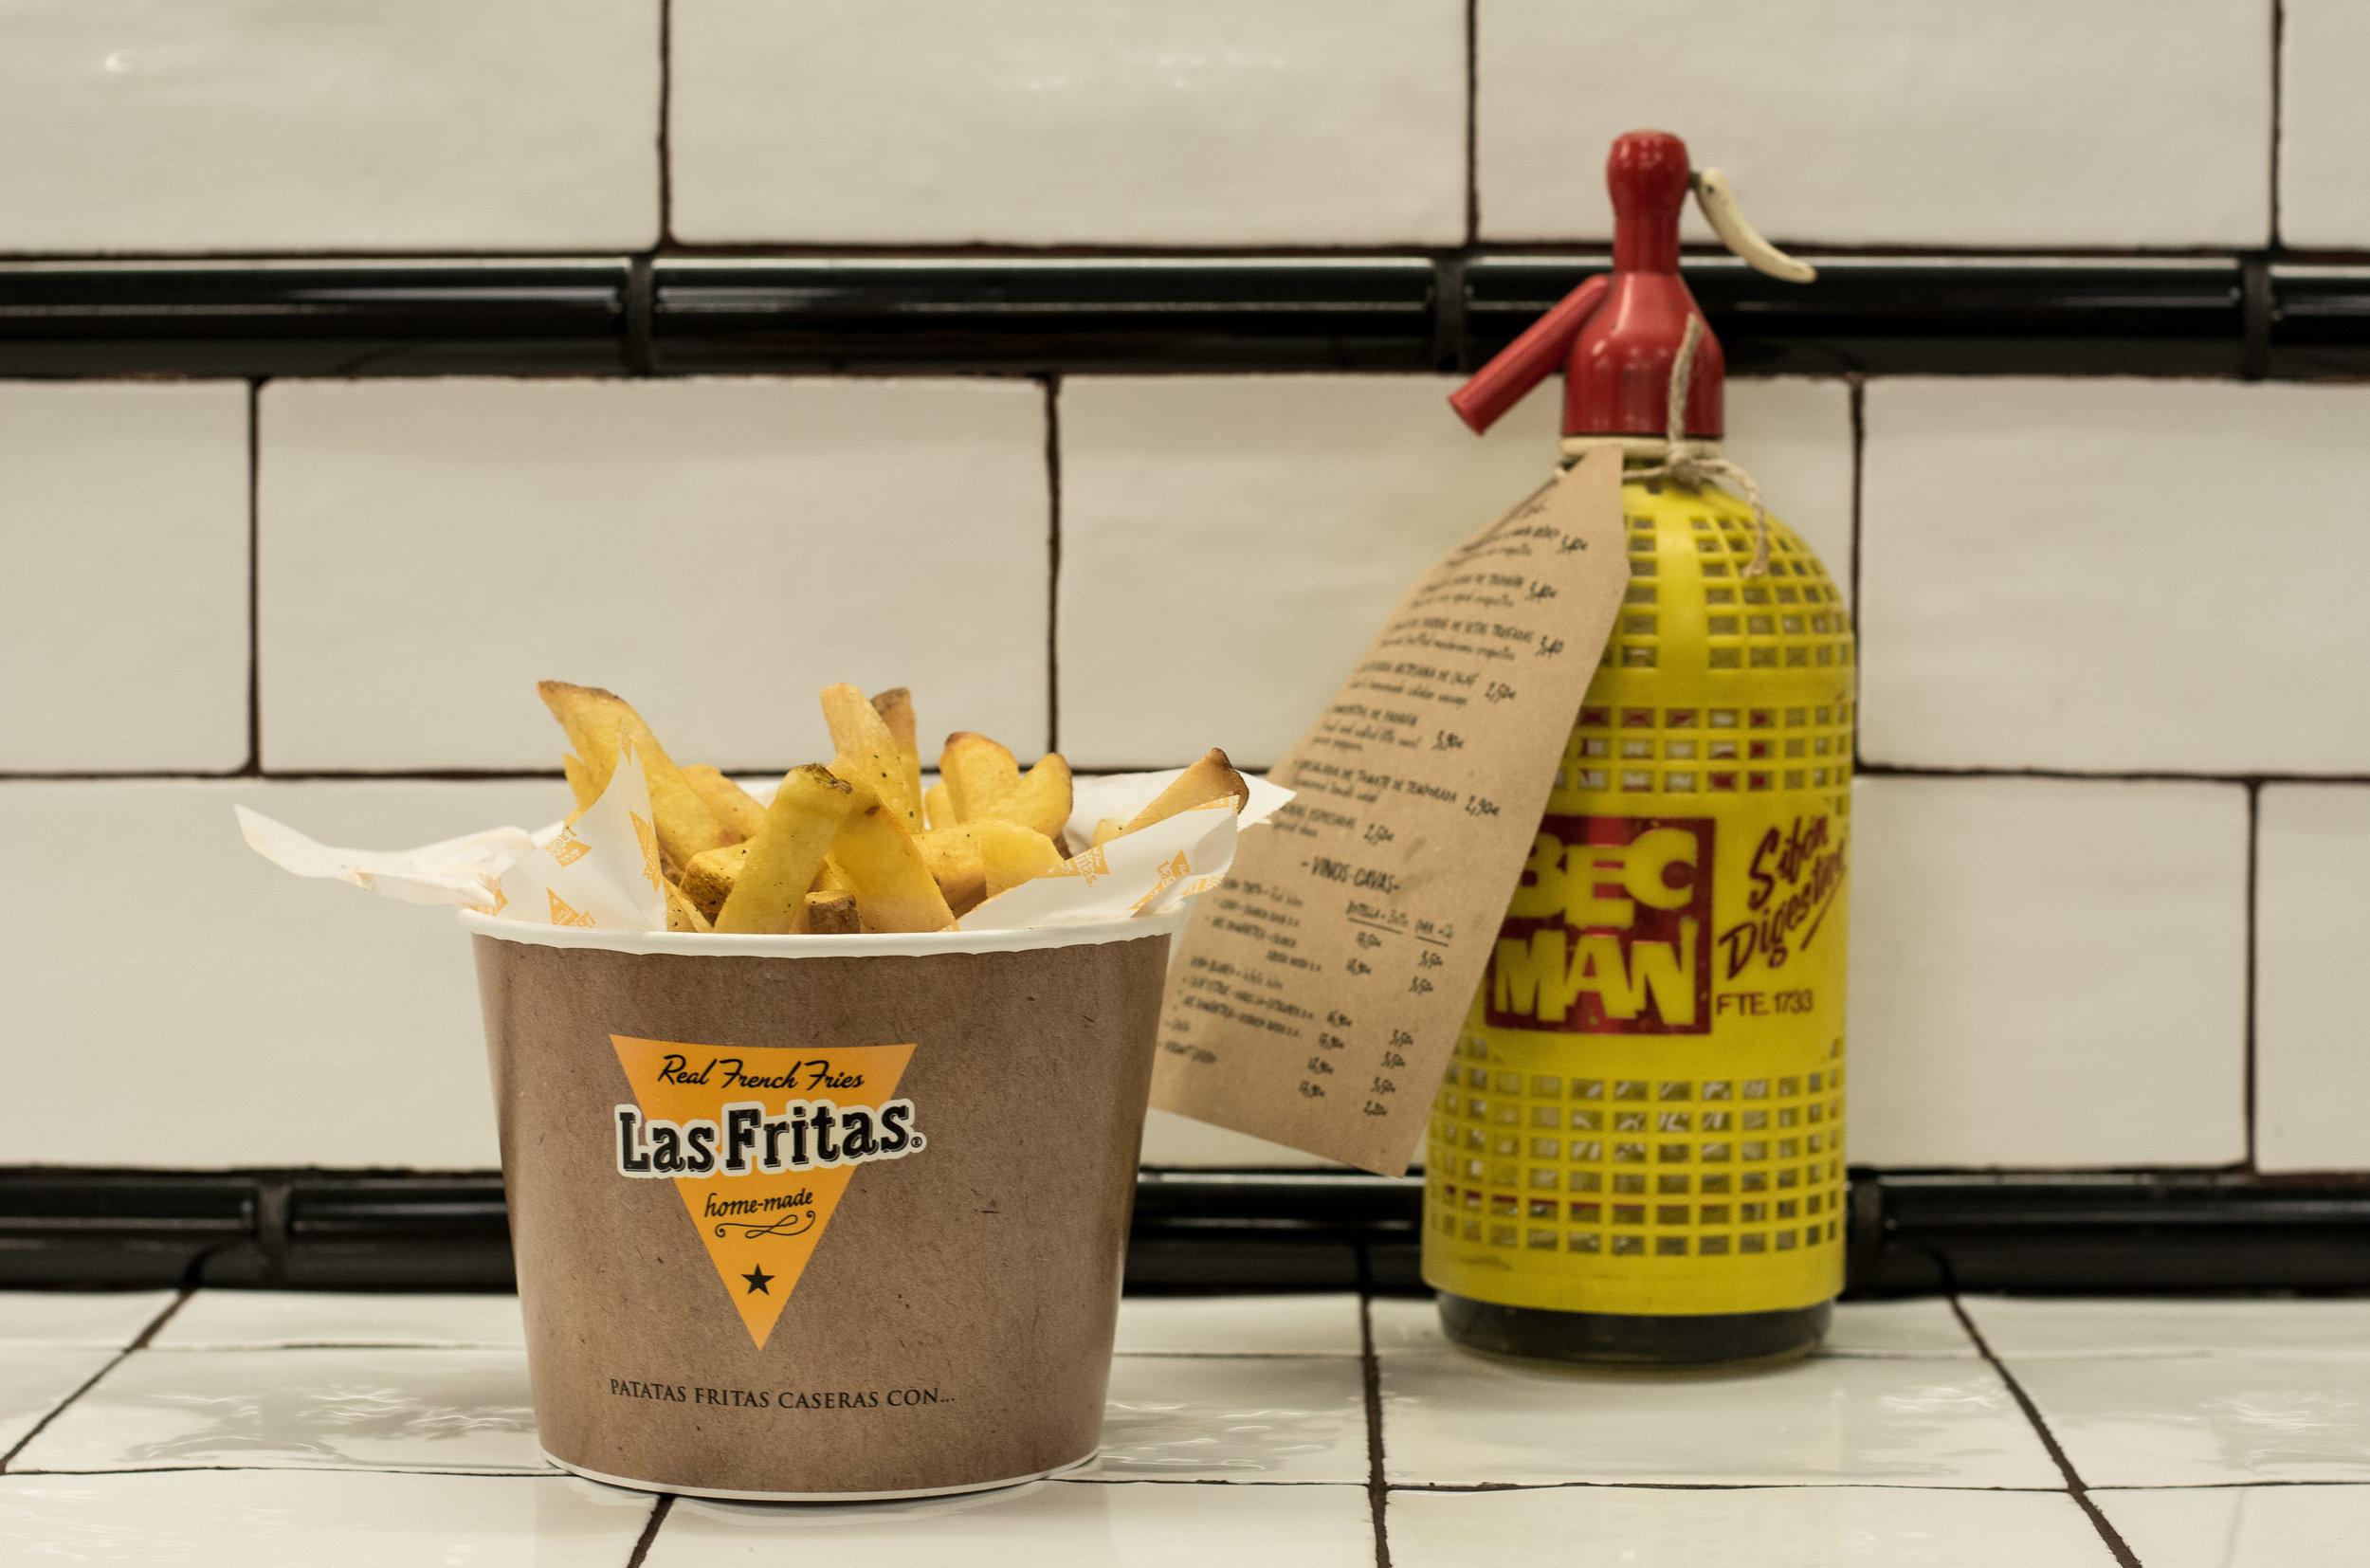 Bucket of fries at Las Fritas, Barcelona